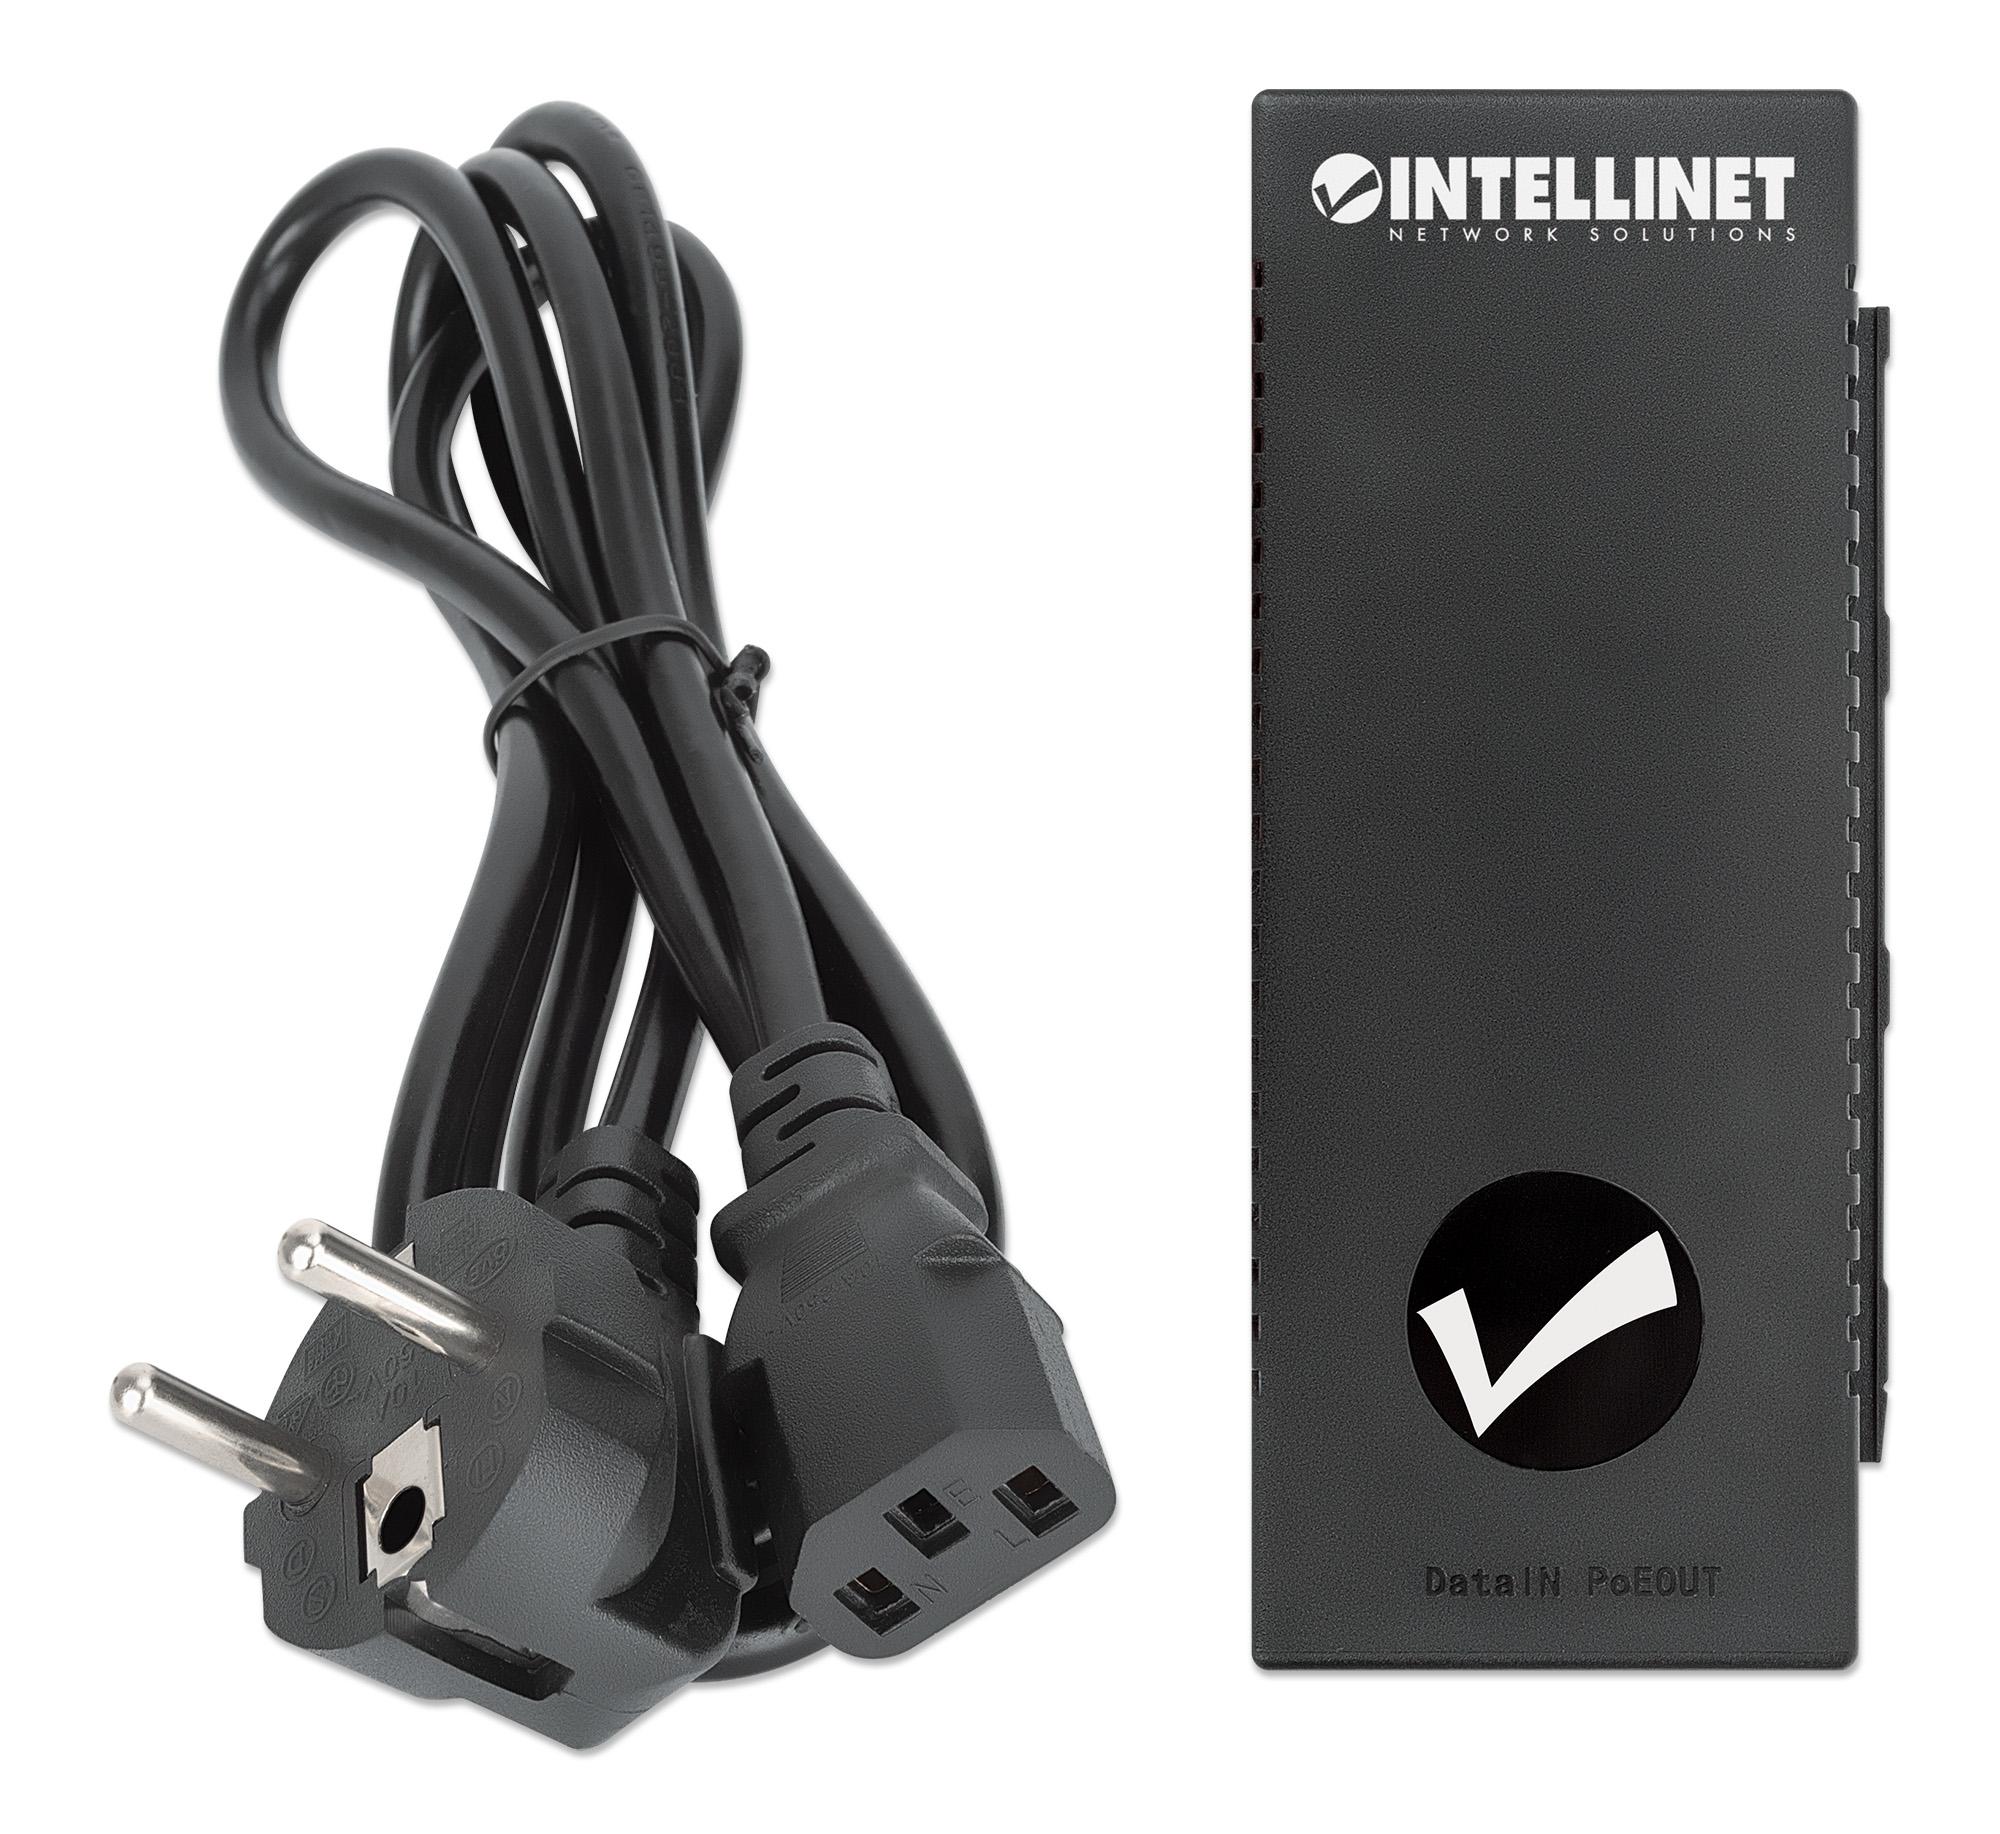 Gigabit Ultra PoE Injector